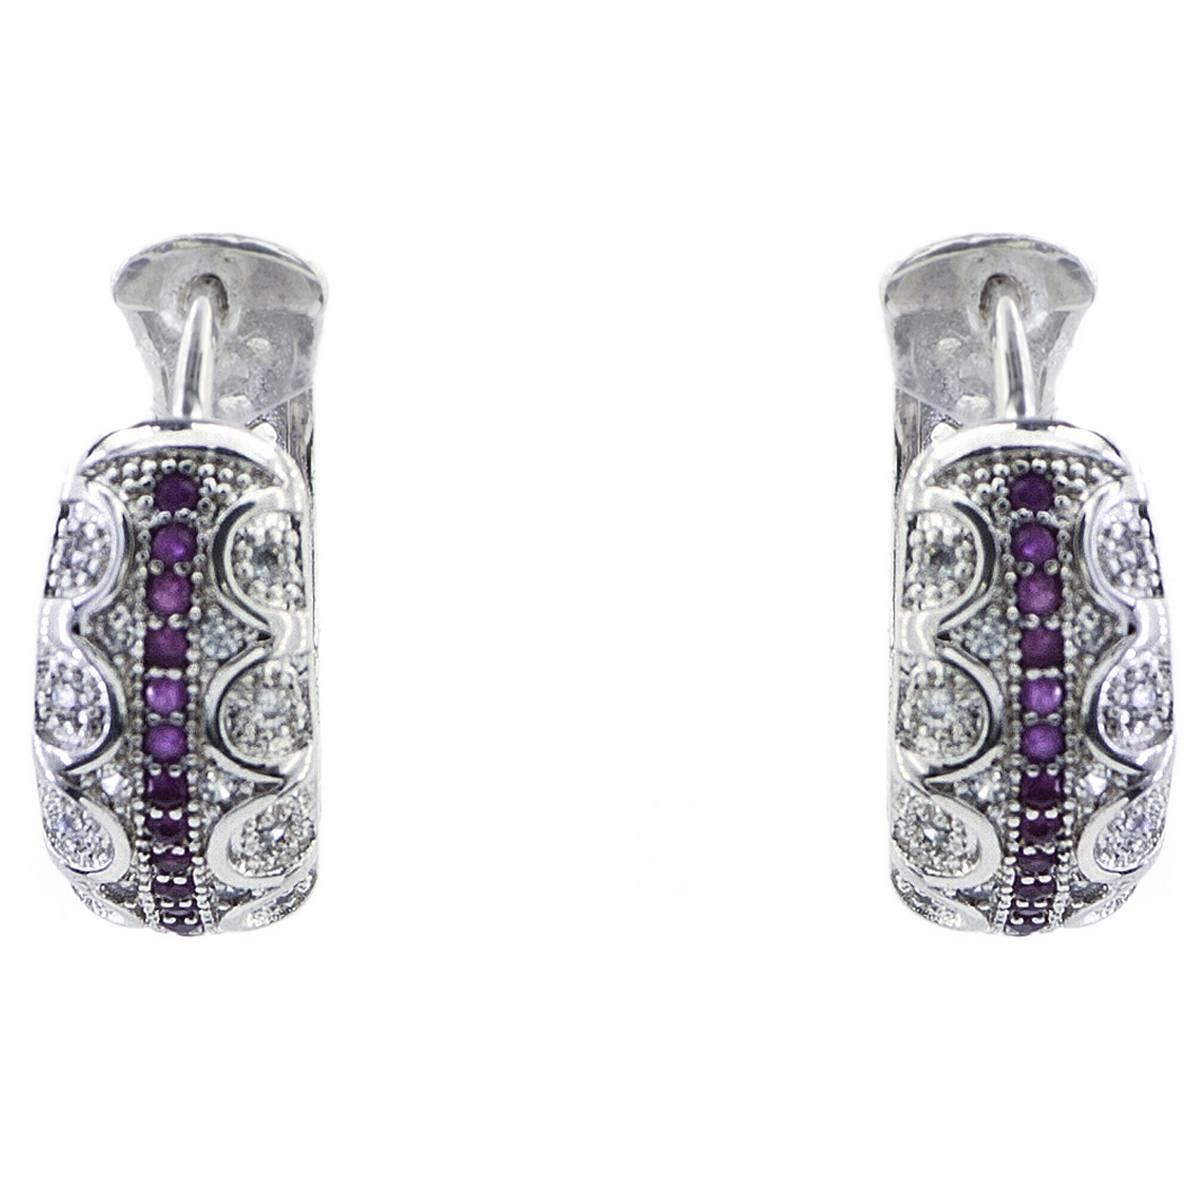 Beautiful Delicate Maroon & White Zircon  925 Sterling Silver Earrings  For Her